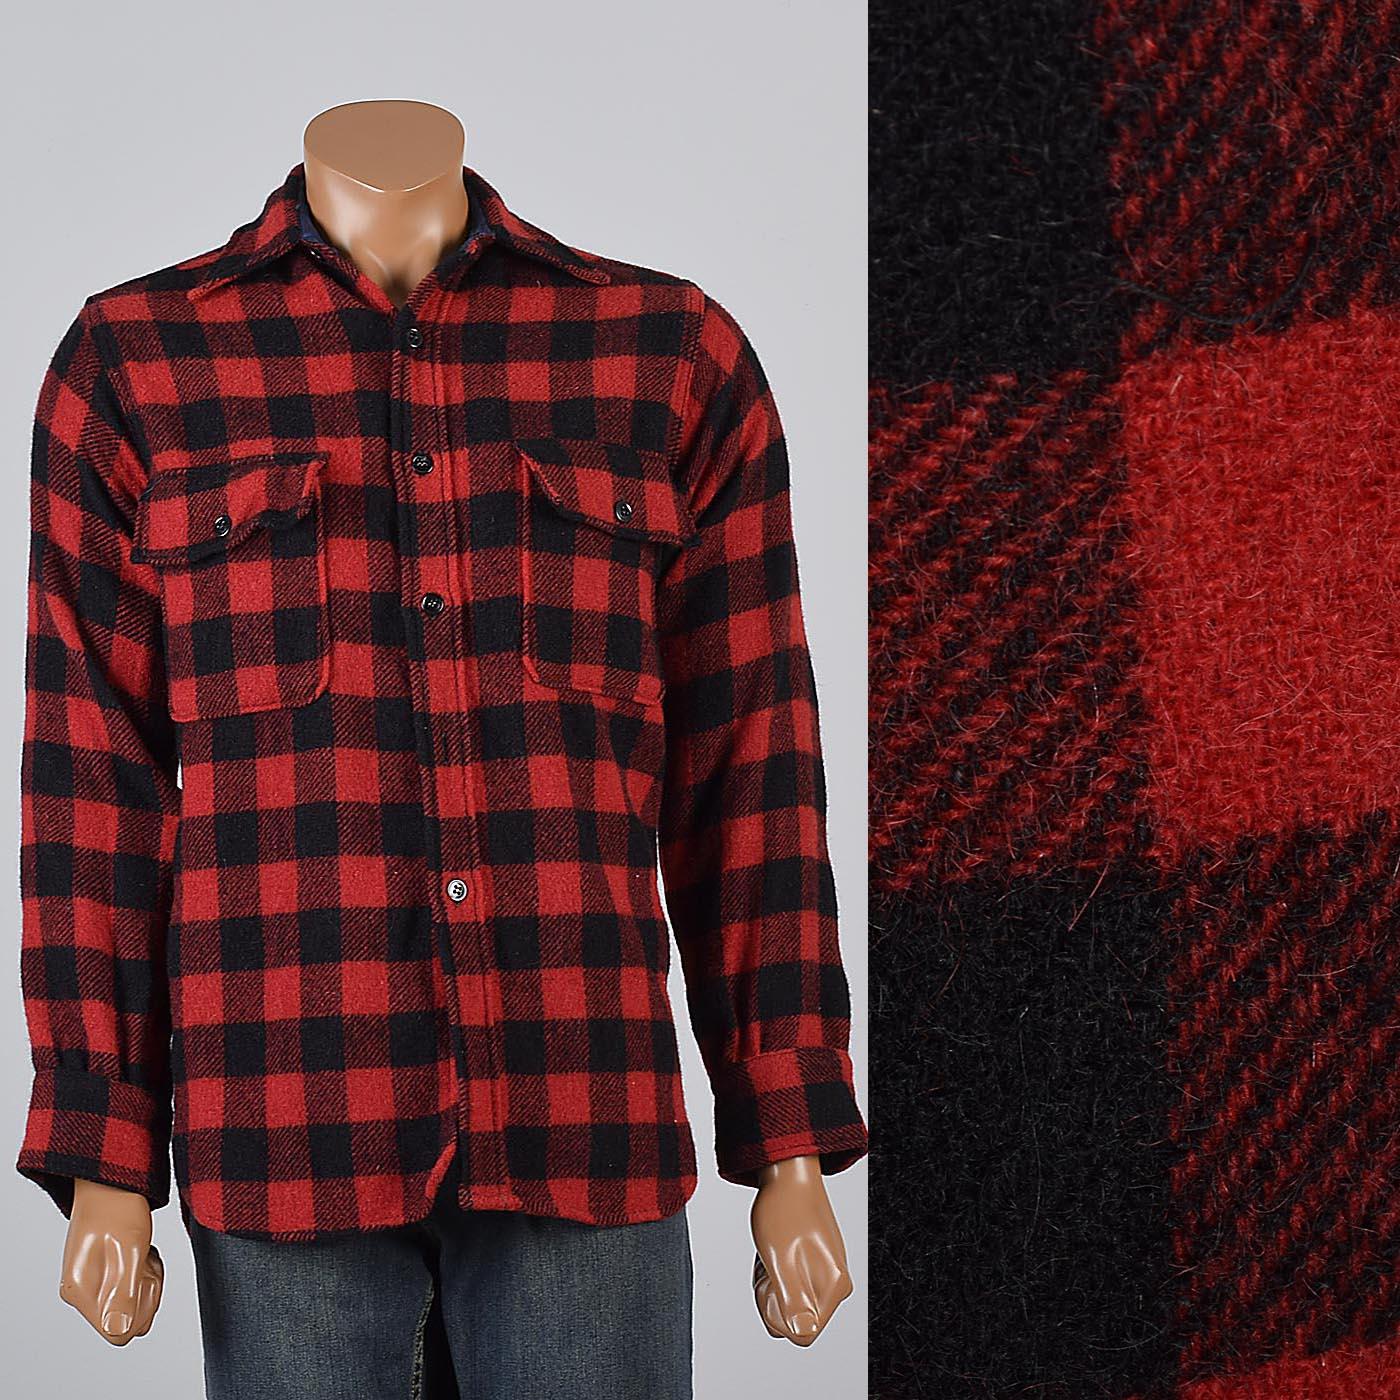 Vintage Plaid Hunting Shirt Women/'s Medium Red Black Plaid Button up Shirt Hunting Club Wool Plaid Button Up Vintage Wool Flannel Shirt